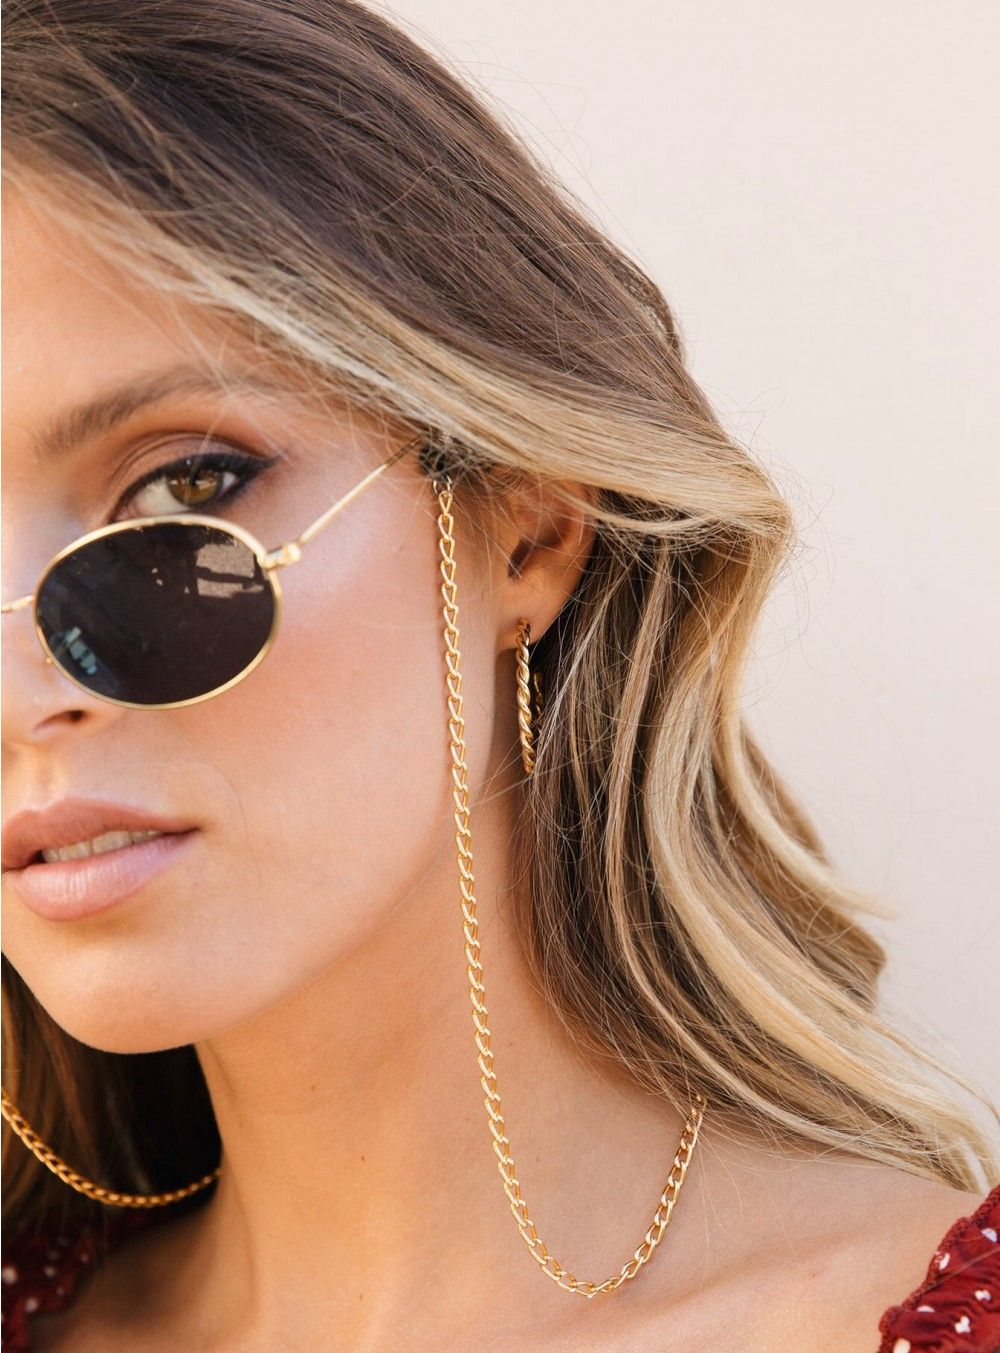 In Sunglasses Chain 2019 Badamp; Boujee GoldJewelry Accessories rxshQdtC